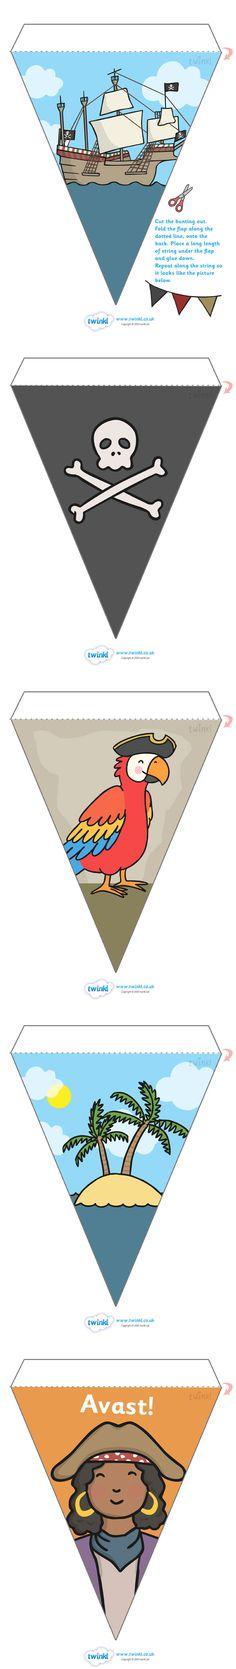 Twinkl Resources >> Pirate Display Bunting  >> Classroom printables for Pre-School, Kindergarten, Elementary School and beyond! Buntings, Display, Pirates, Classroom Decor